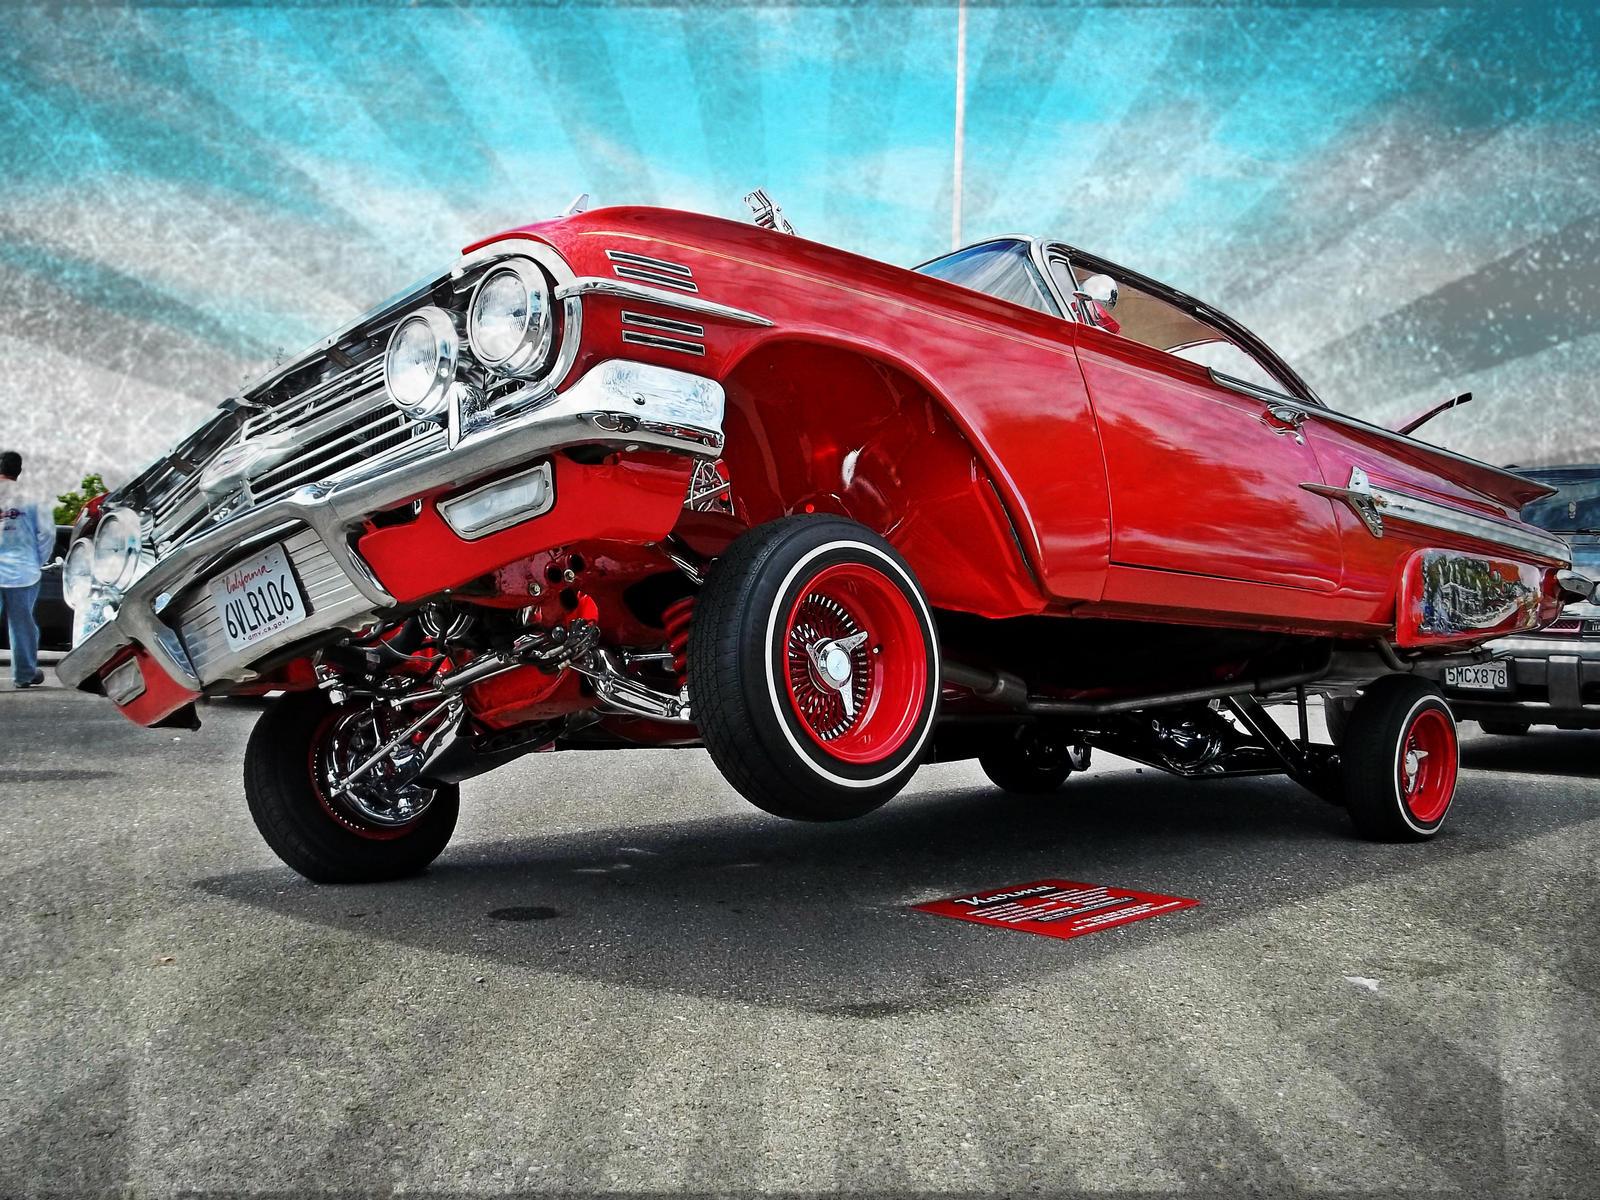 1960 Chevy Impala Lowrider by anrandap on DeviantArt